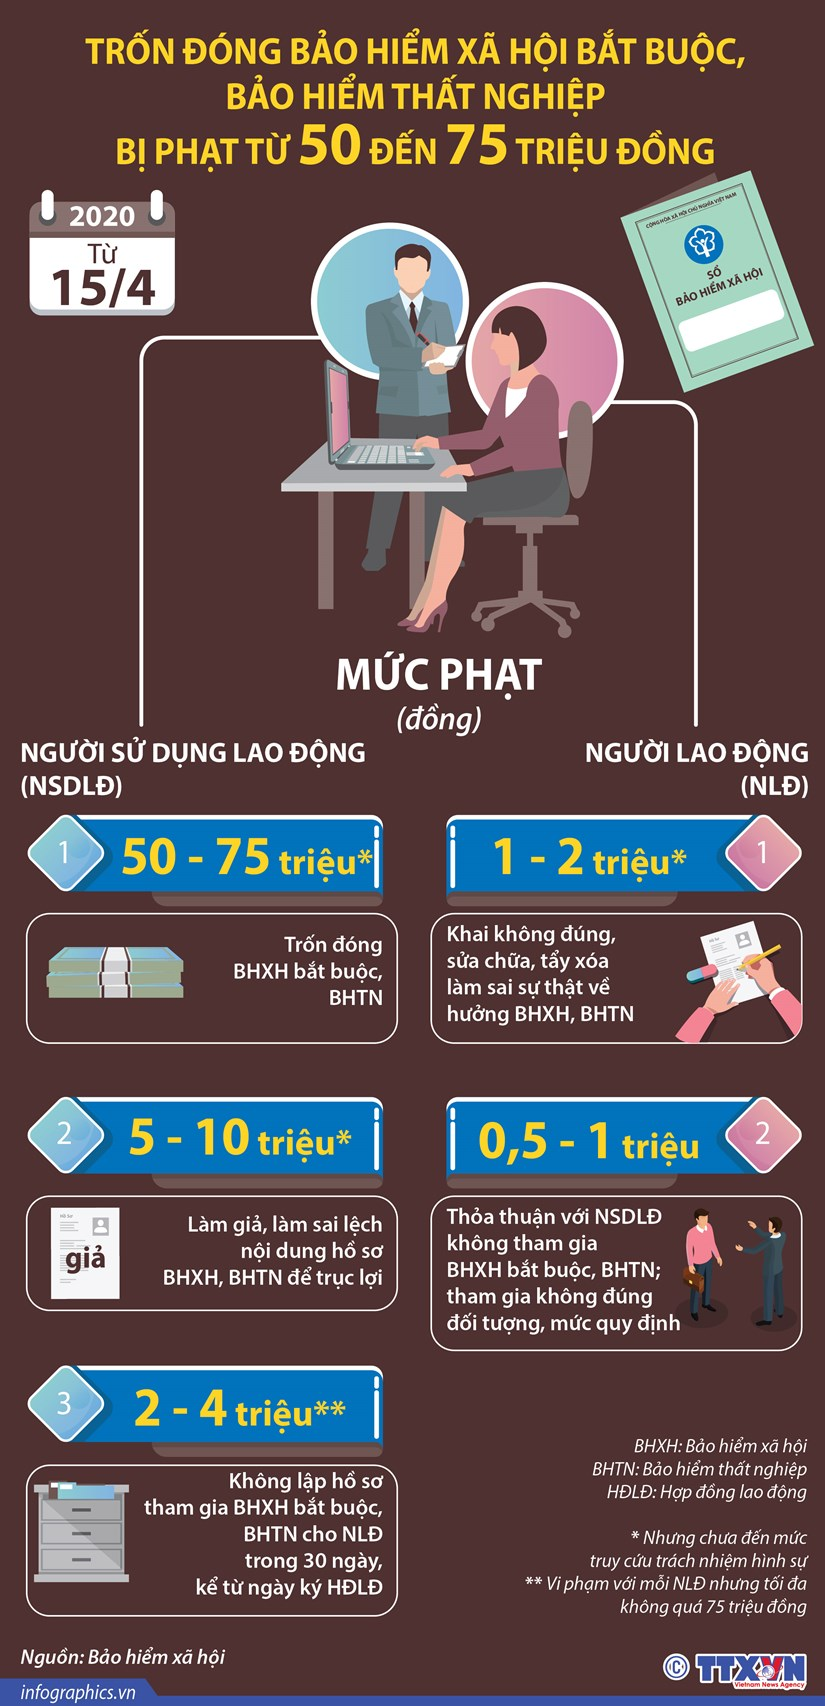 [Infographics] Muc phat khi tron dong bao hiem xa hoi bat buoc hinh anh 1